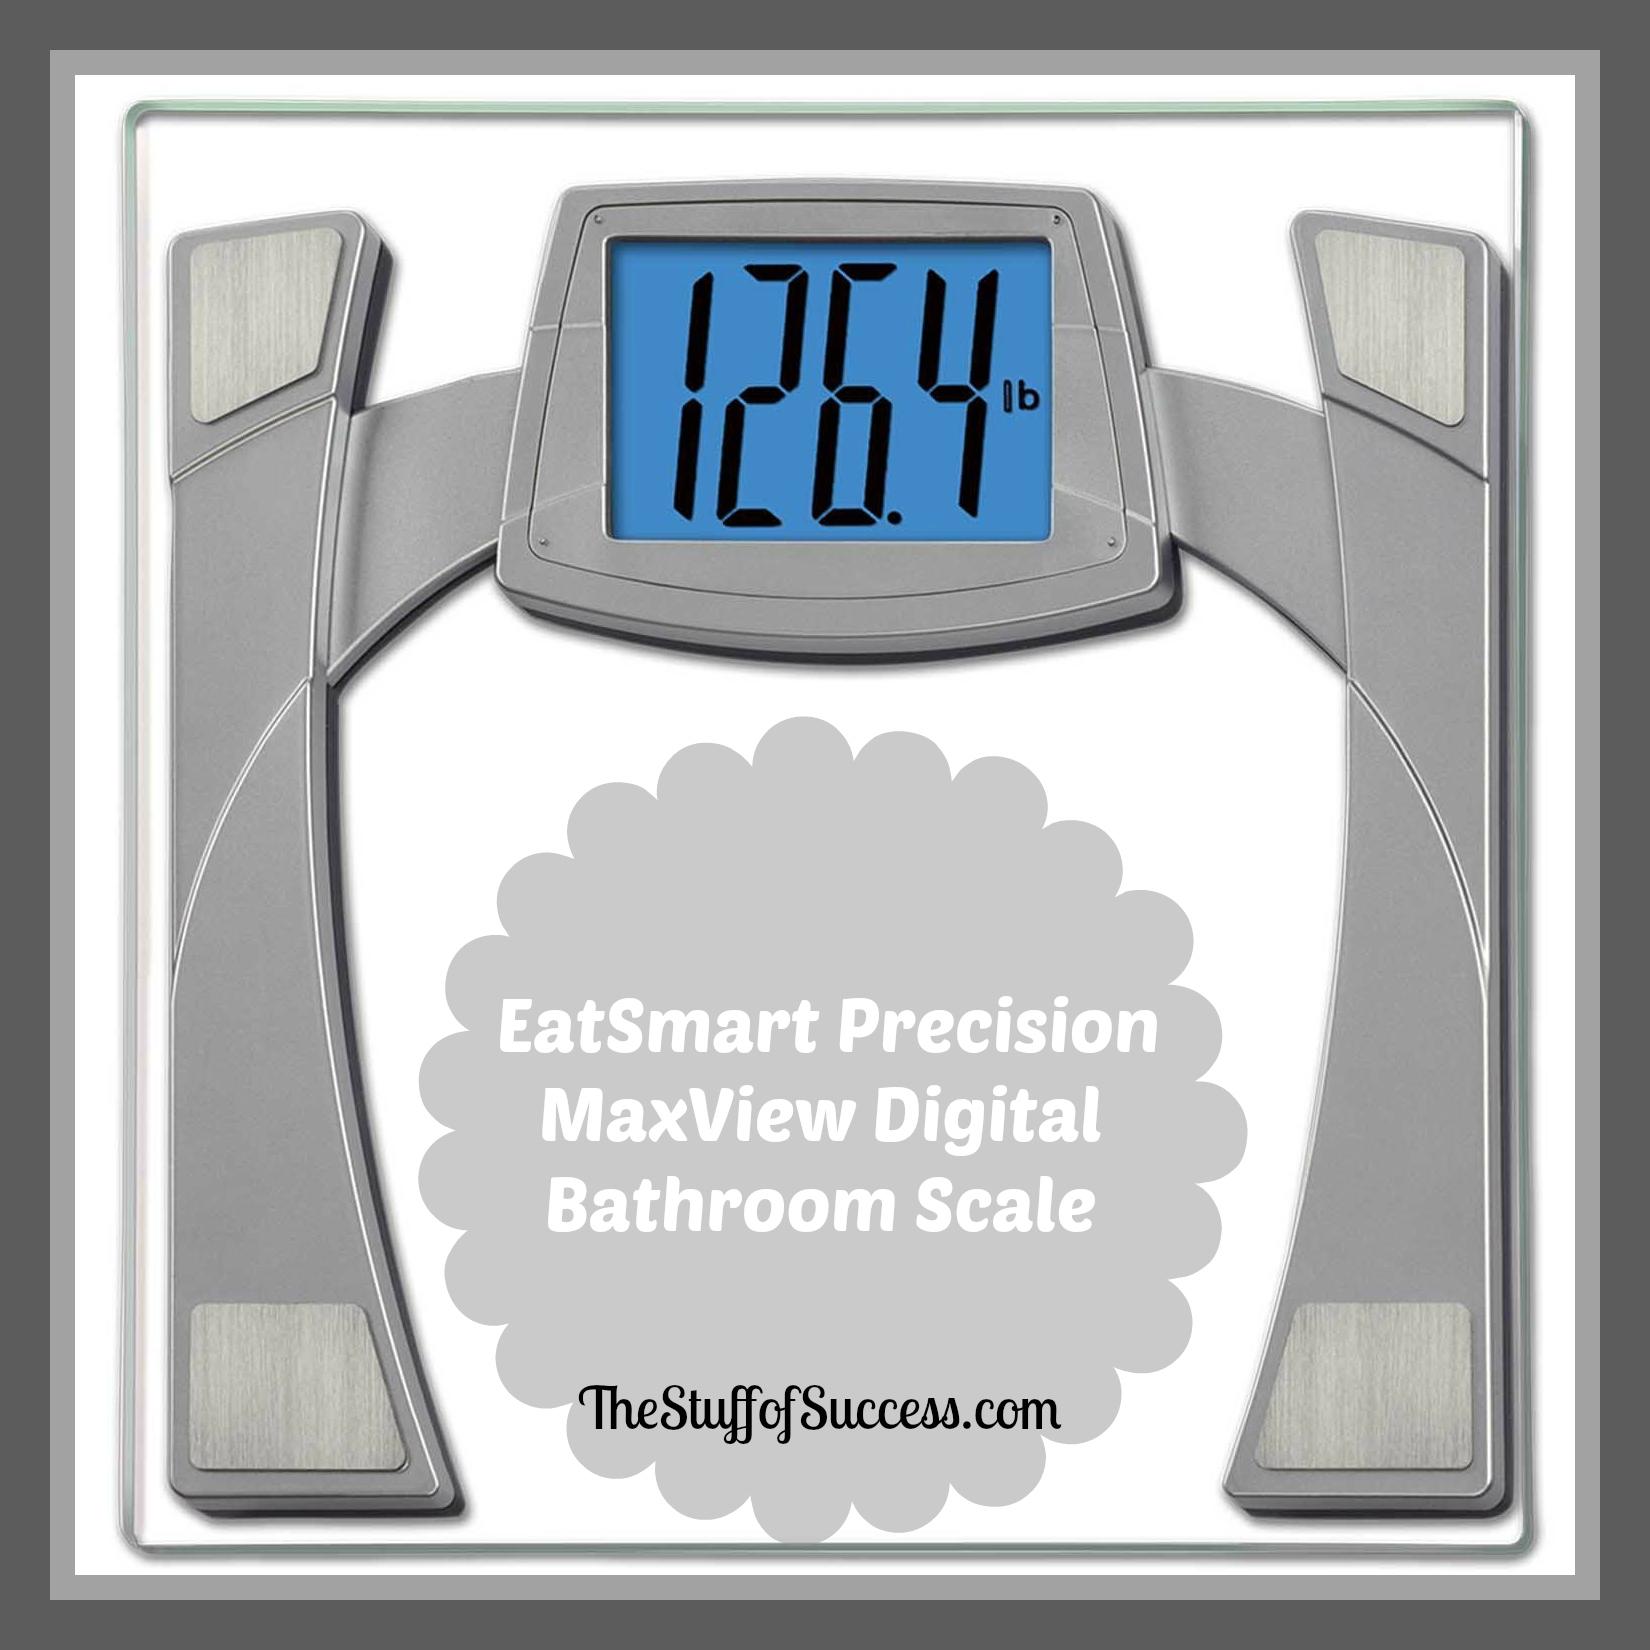 #EatSmart Precision MaxView Digital Bathroom Scale ⋆ The ...